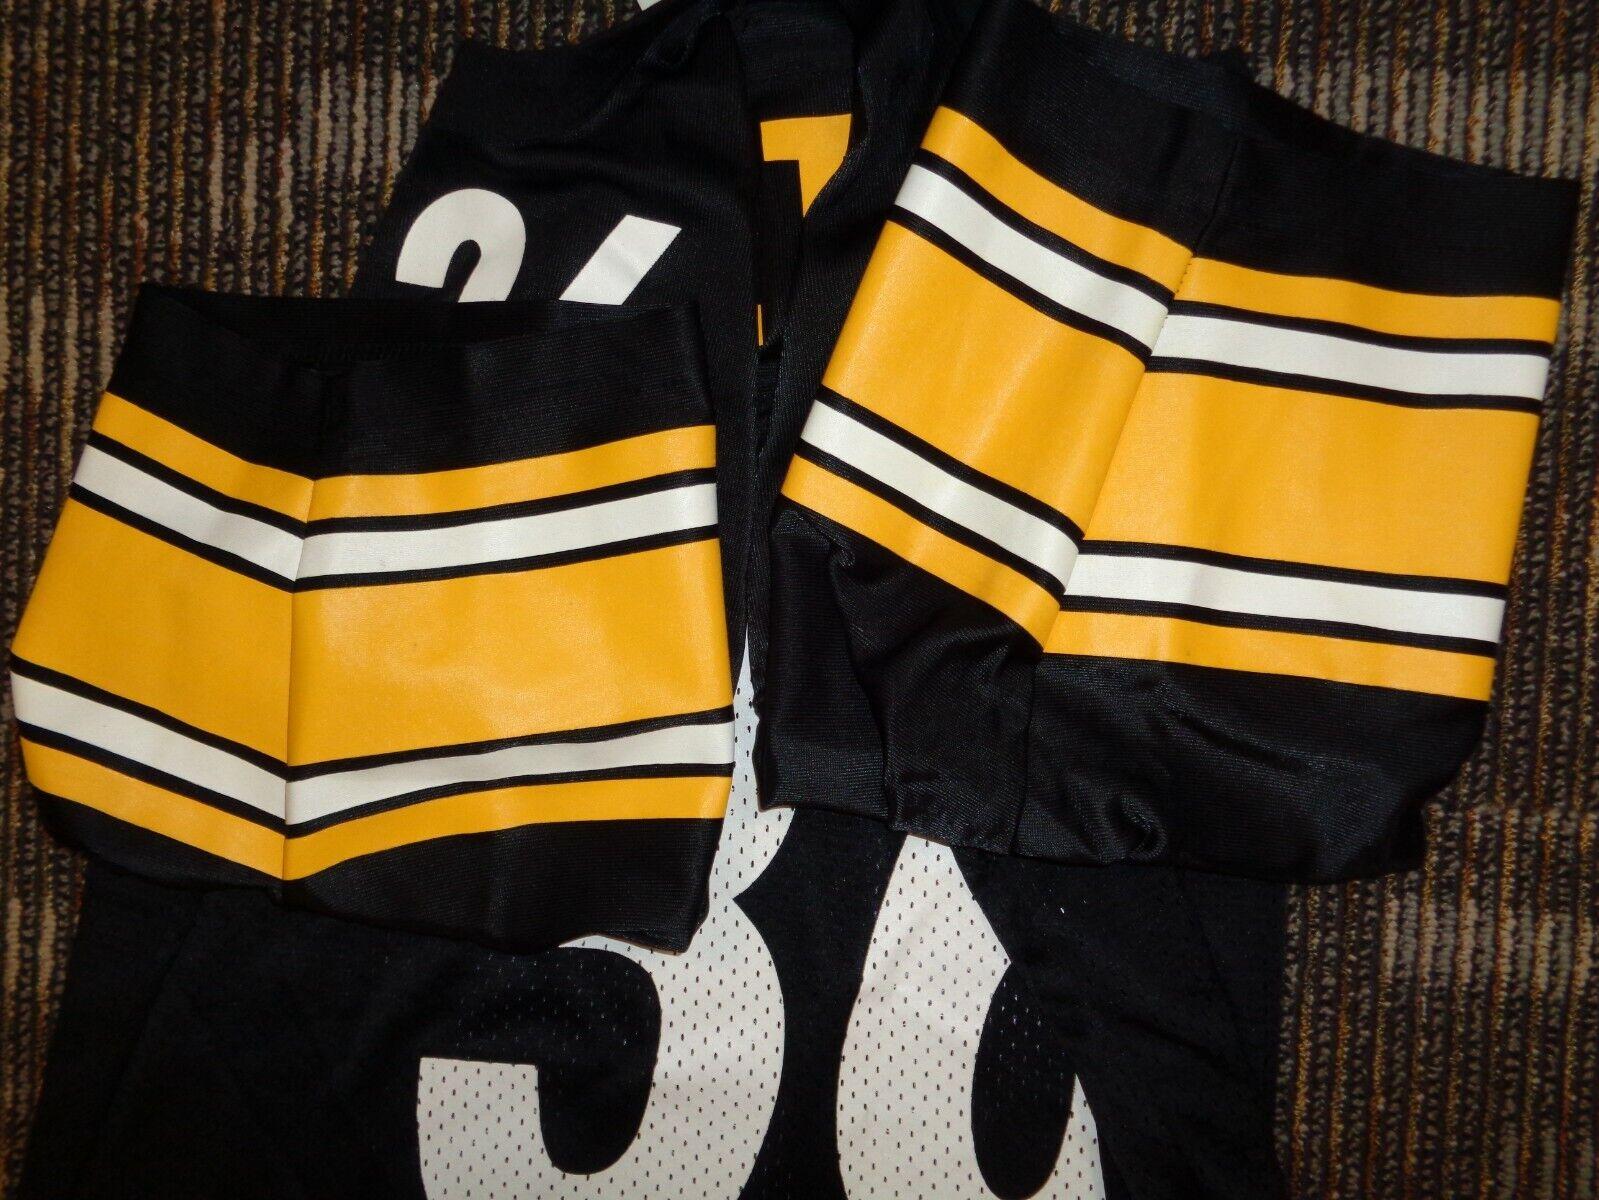 LOT-JEROME BETTIS LEVON KIRKLAND PITTSBURGH STEELERS STARTER NFL GAME JERSEYS - $59.99